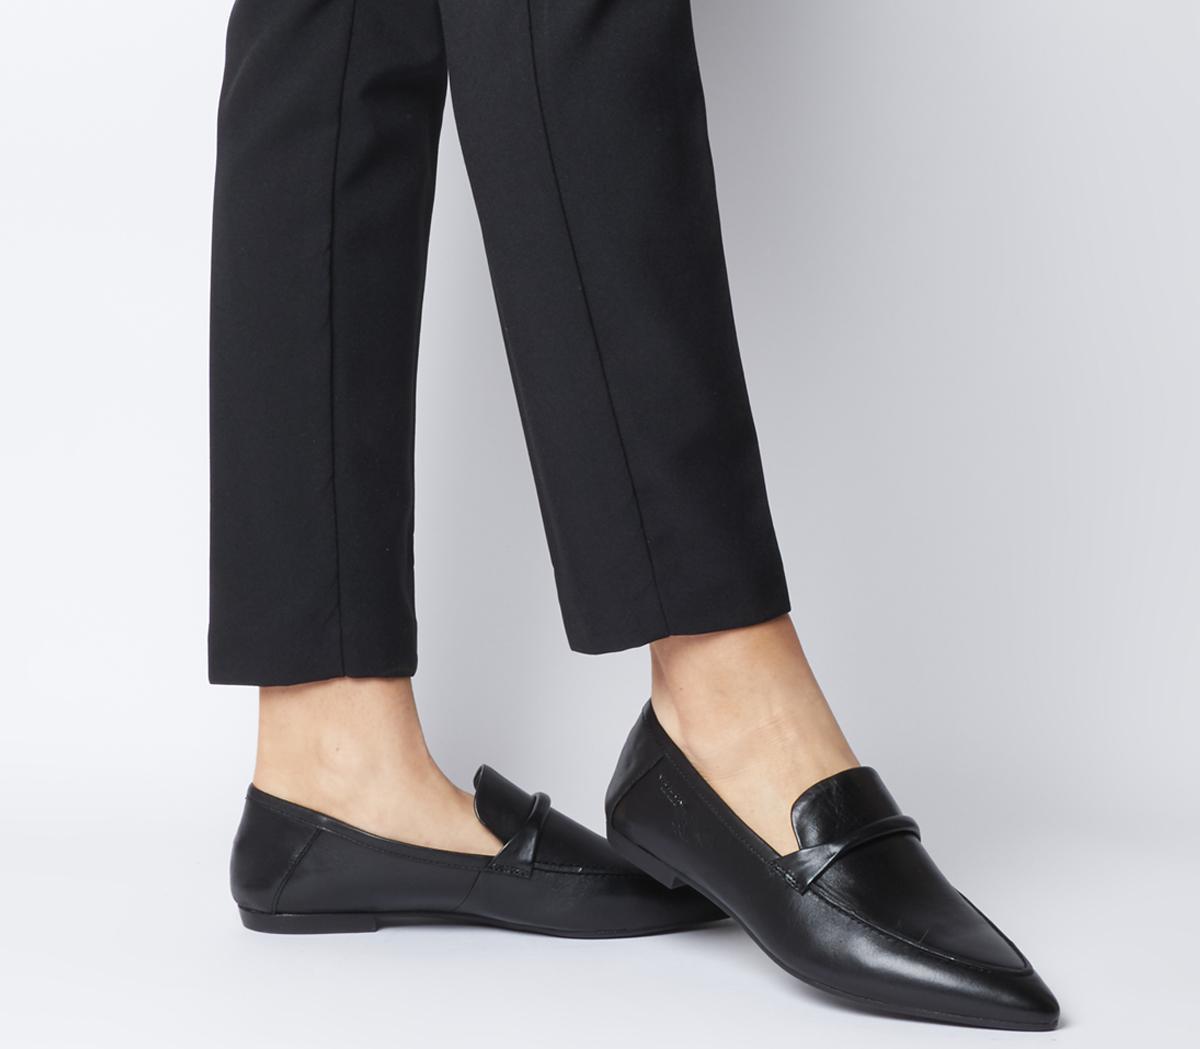 Vagabond Katlin Loafers Black Leather